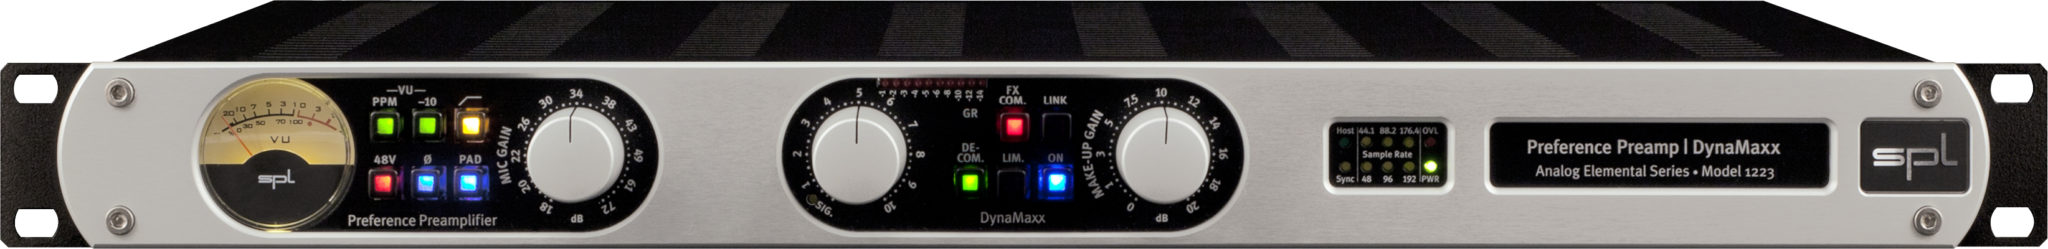 Preference_DynaMaxx_front_print